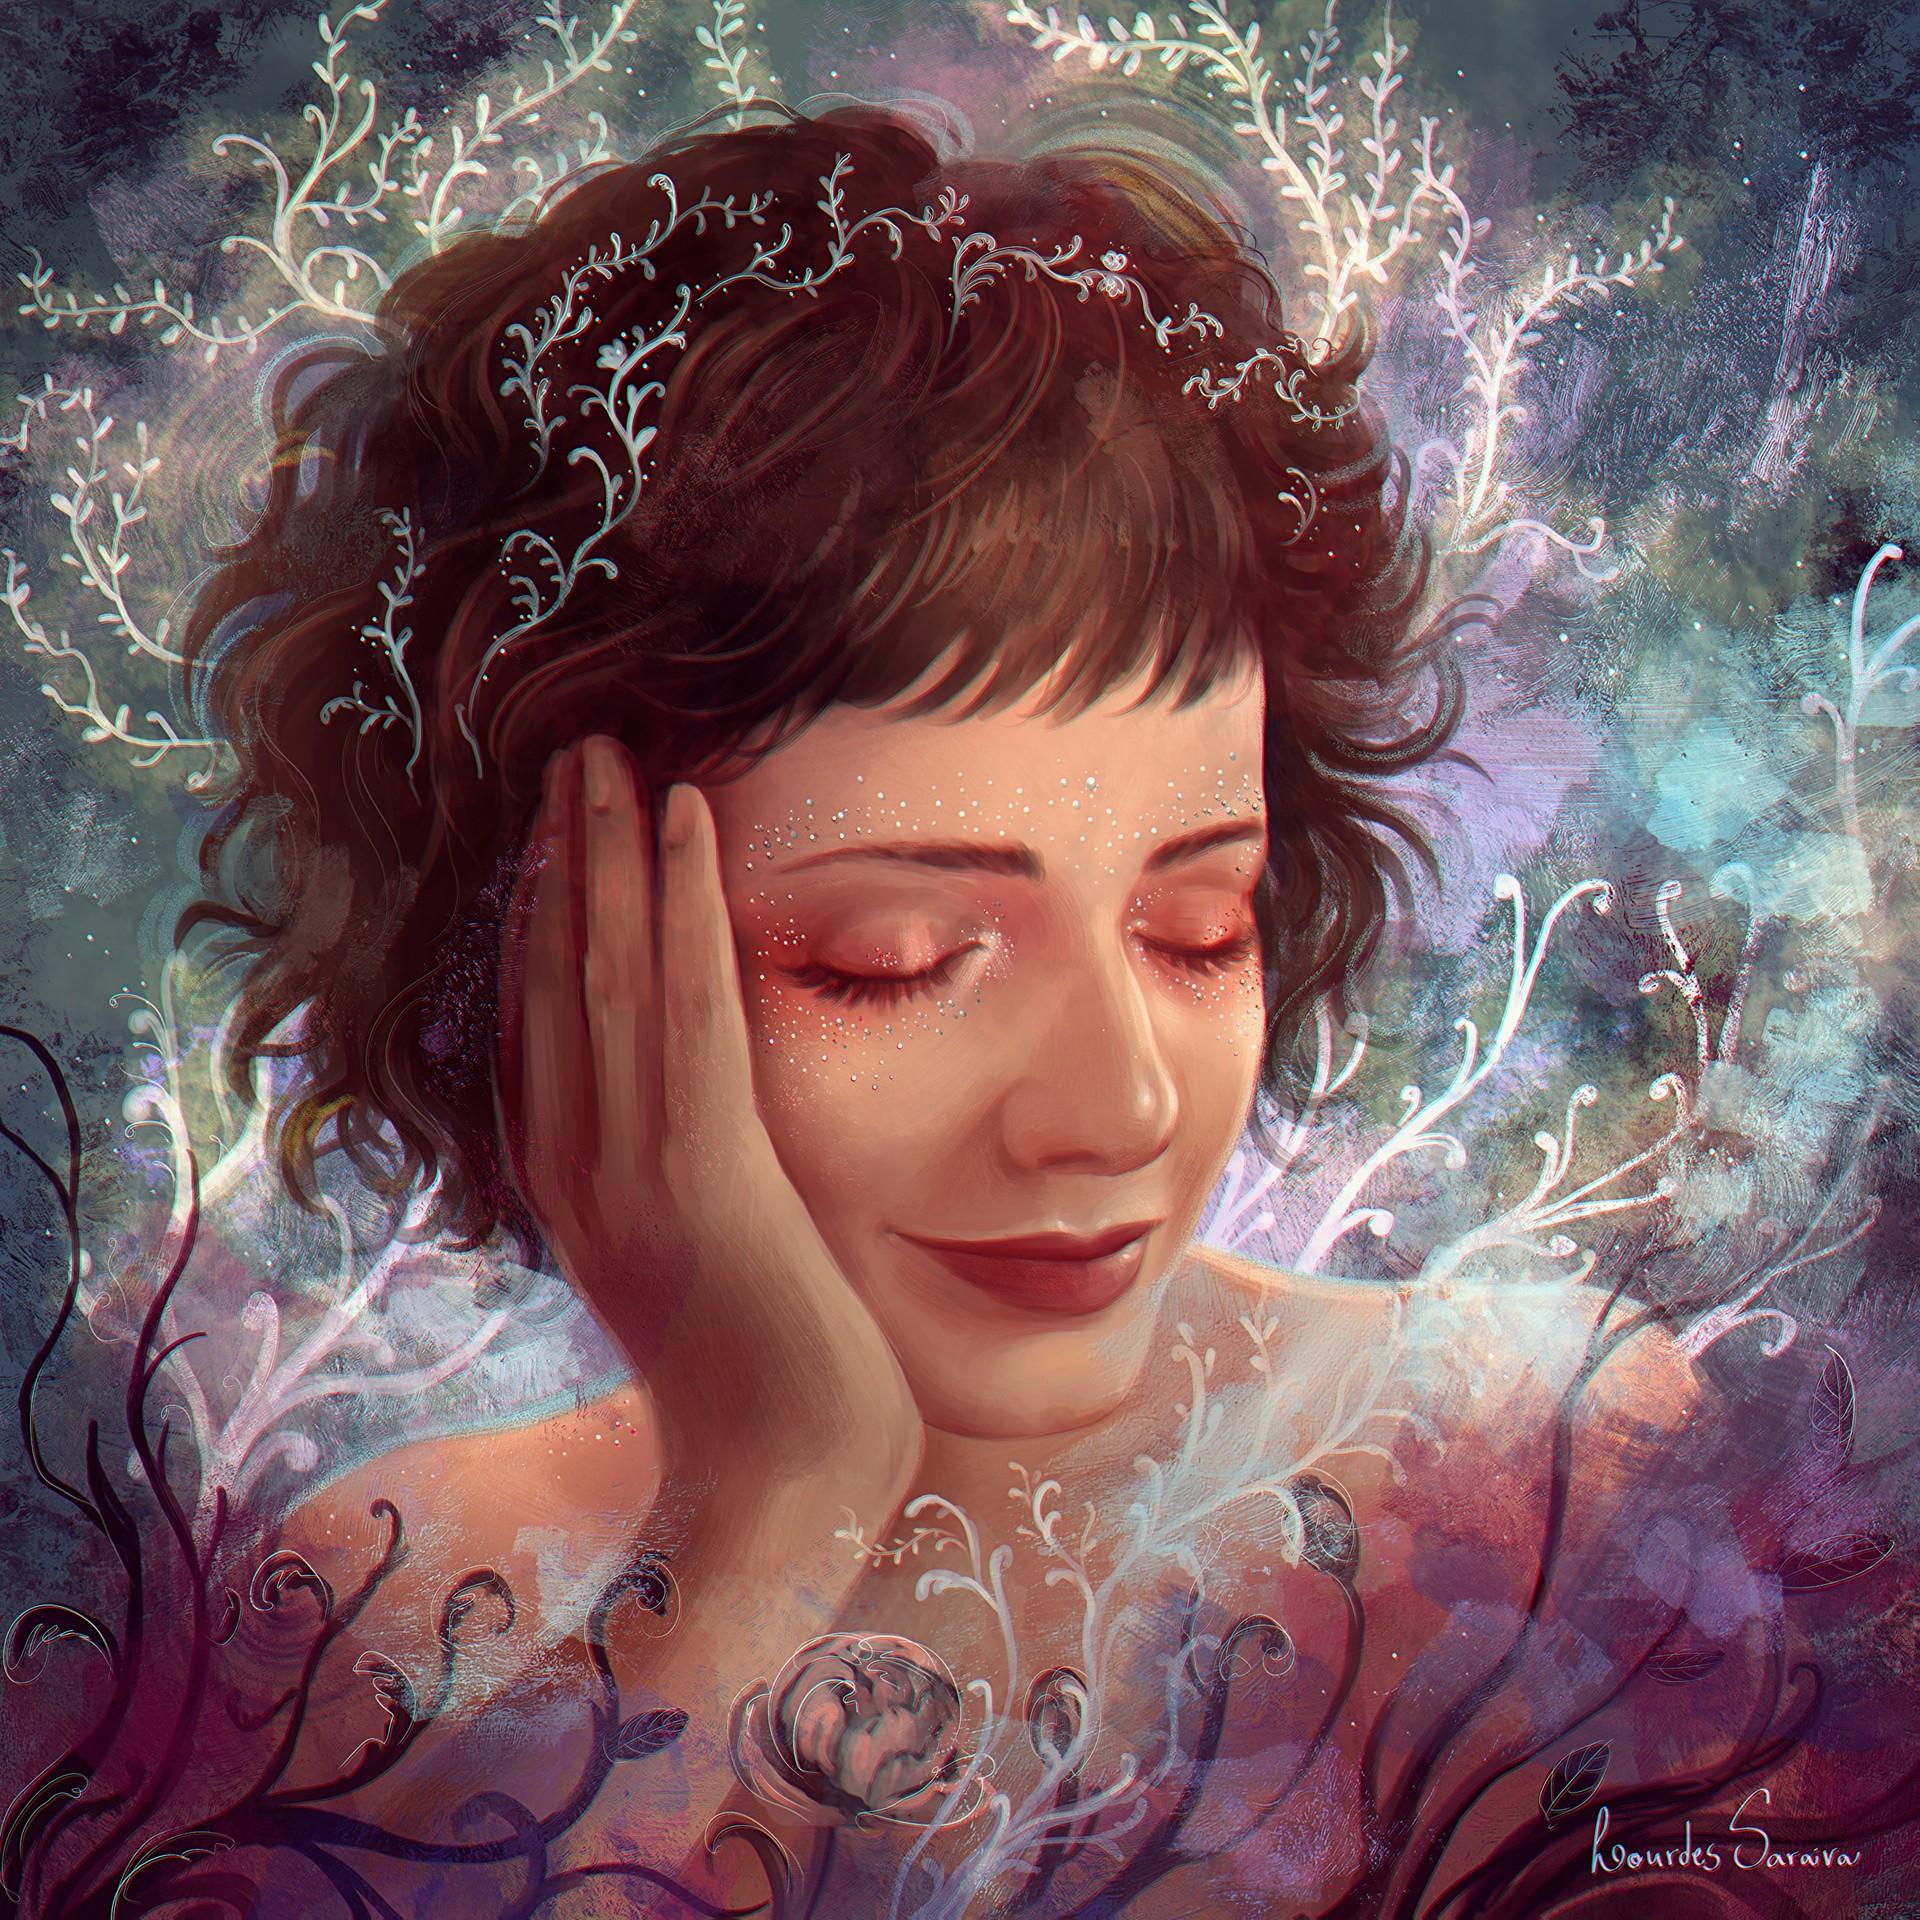 Lourdes saraiva amanda florzinha